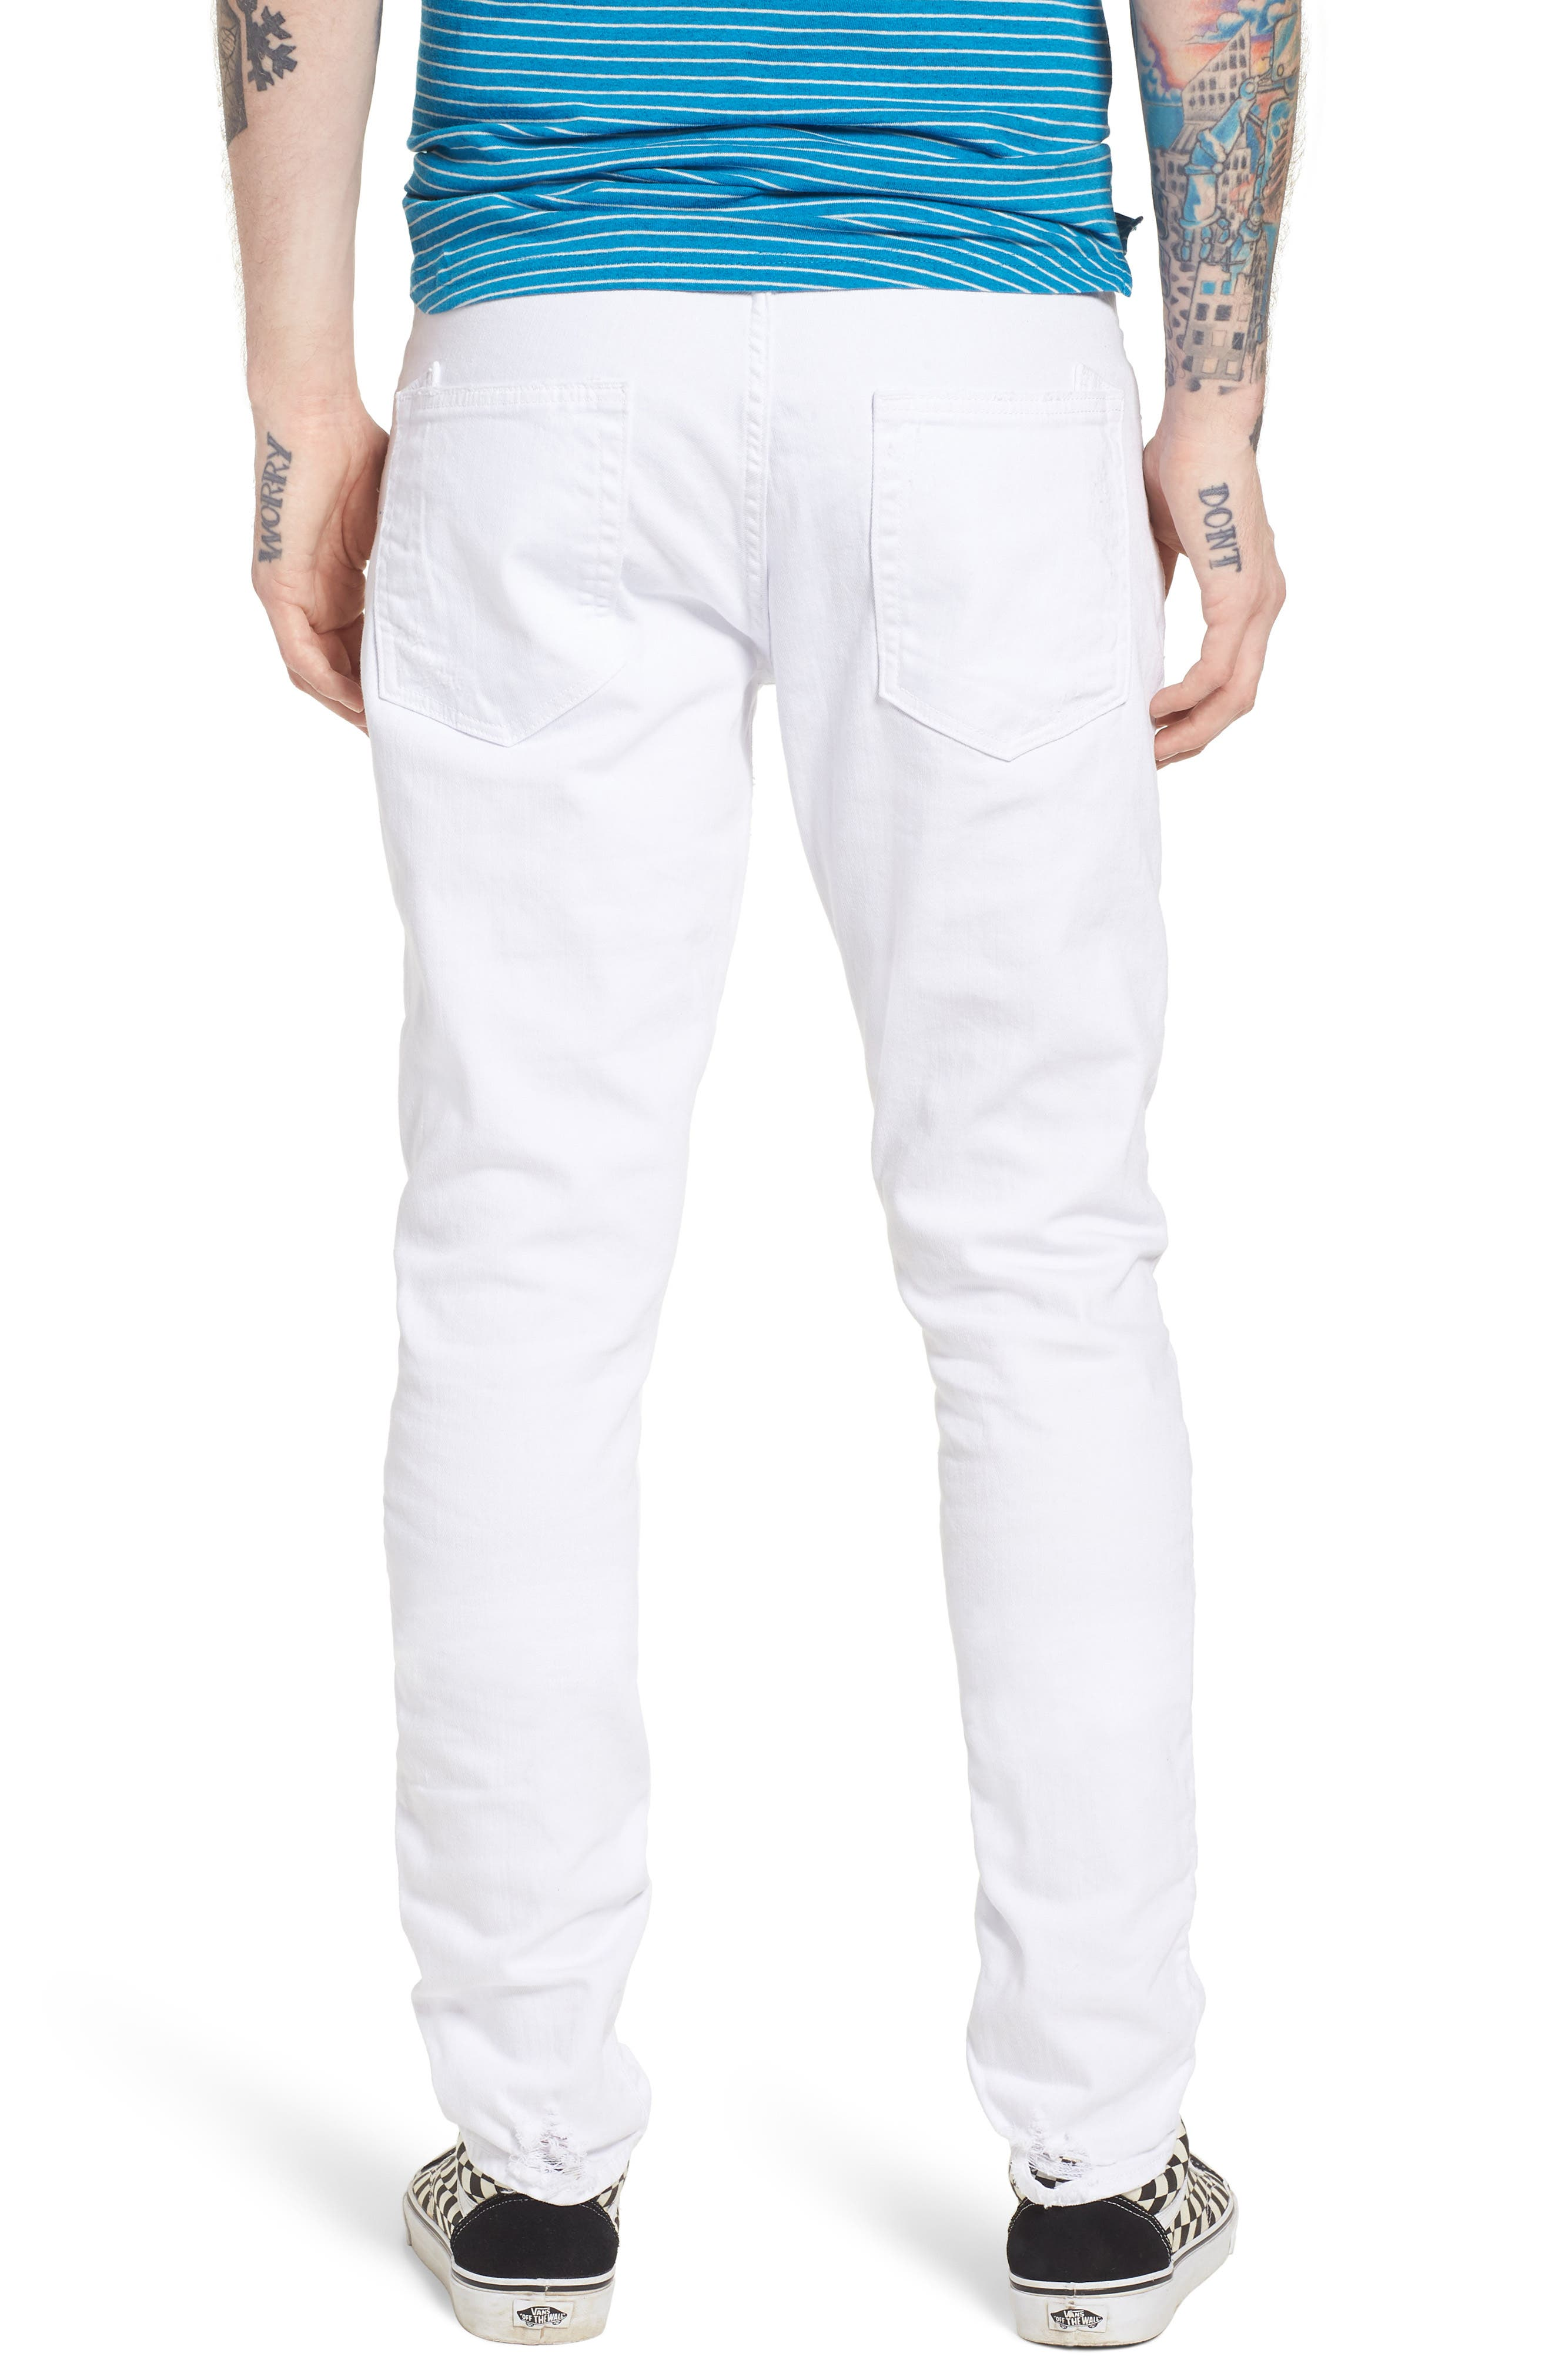 Windsor Slim Fit Jeans,                             Alternate thumbnail 2, color,                             100